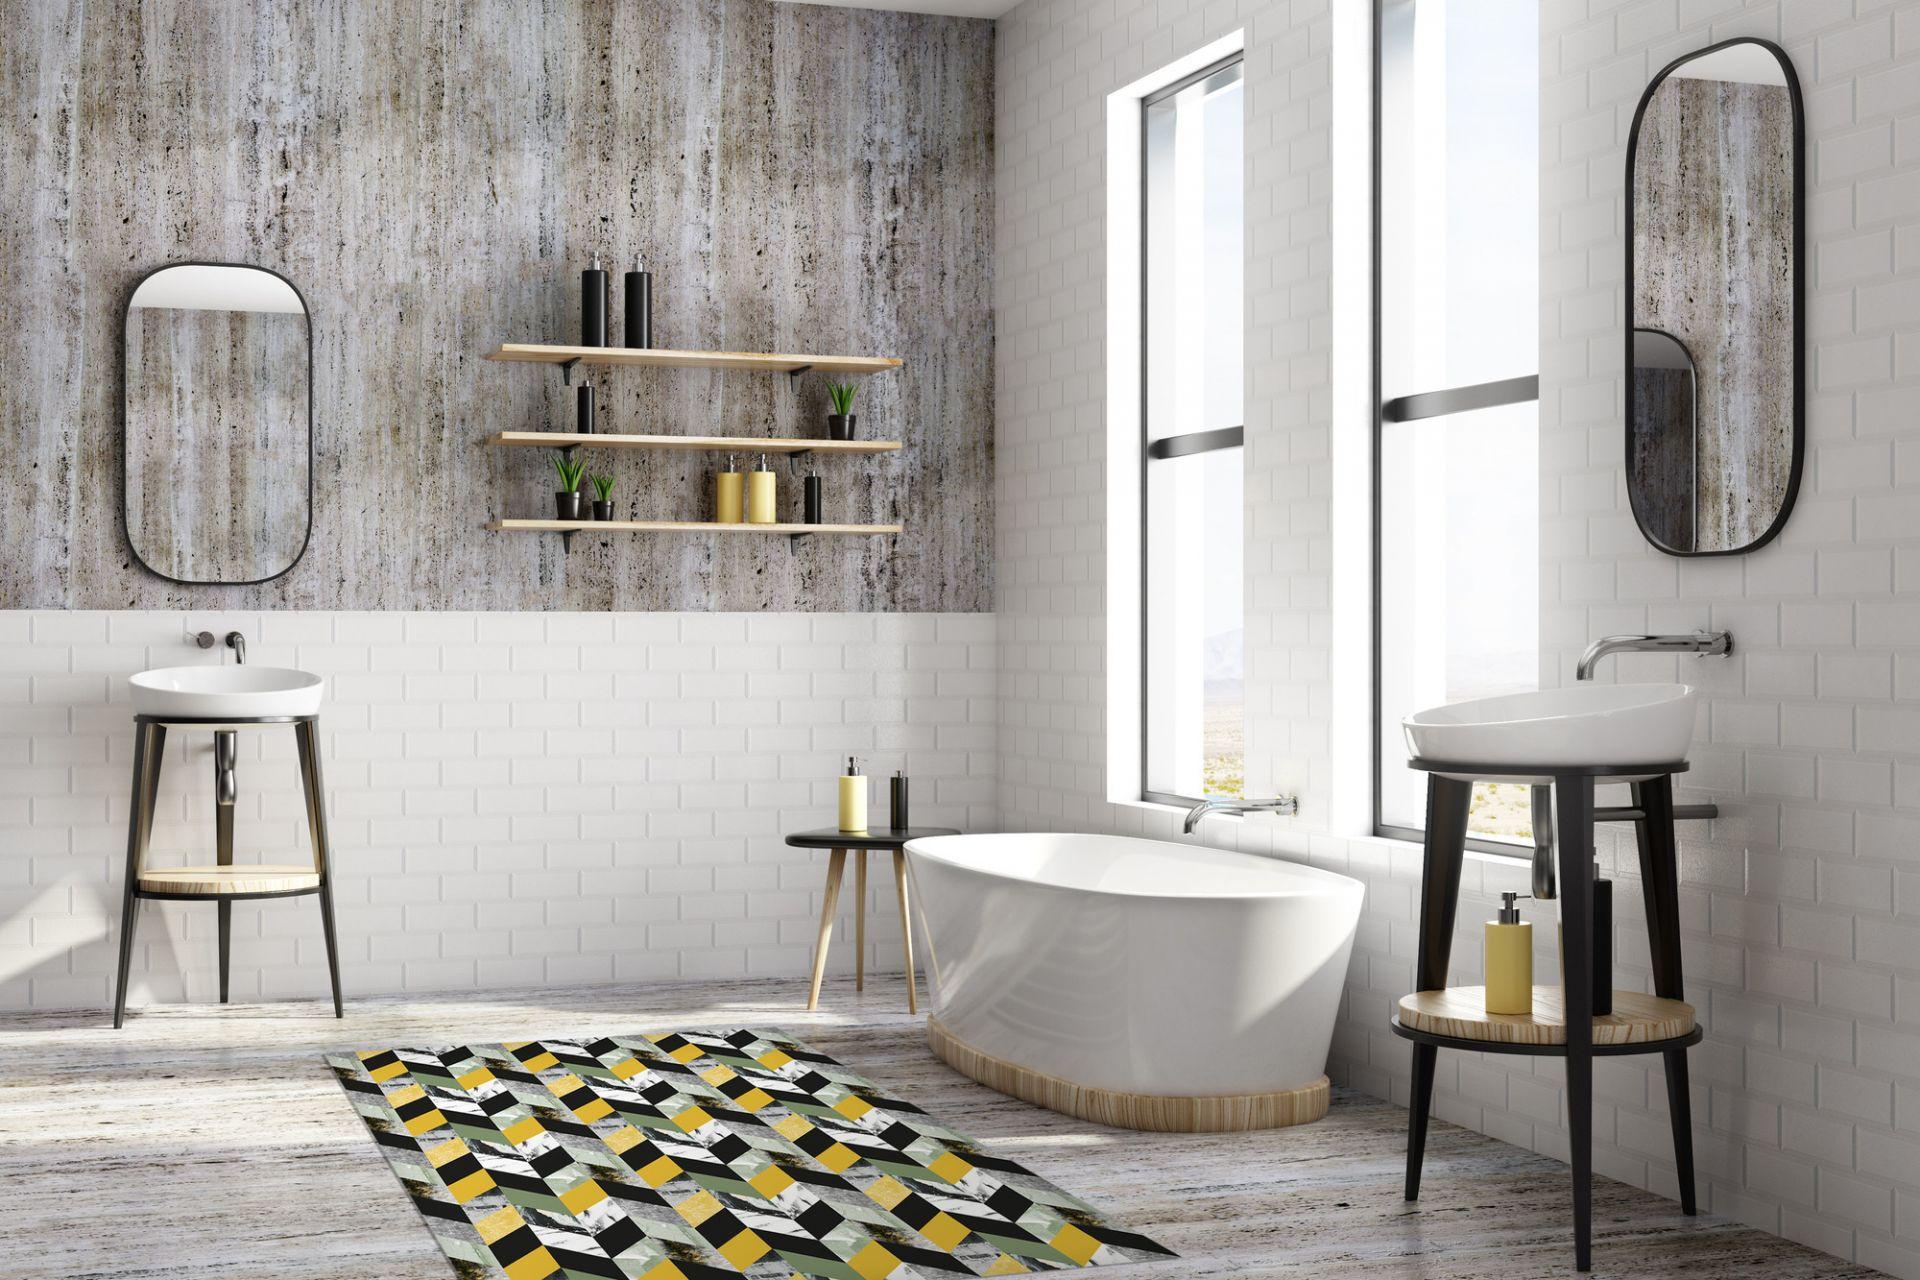 Matteo Vinyl Carpet Ethno black-white Contento 90x60 cm